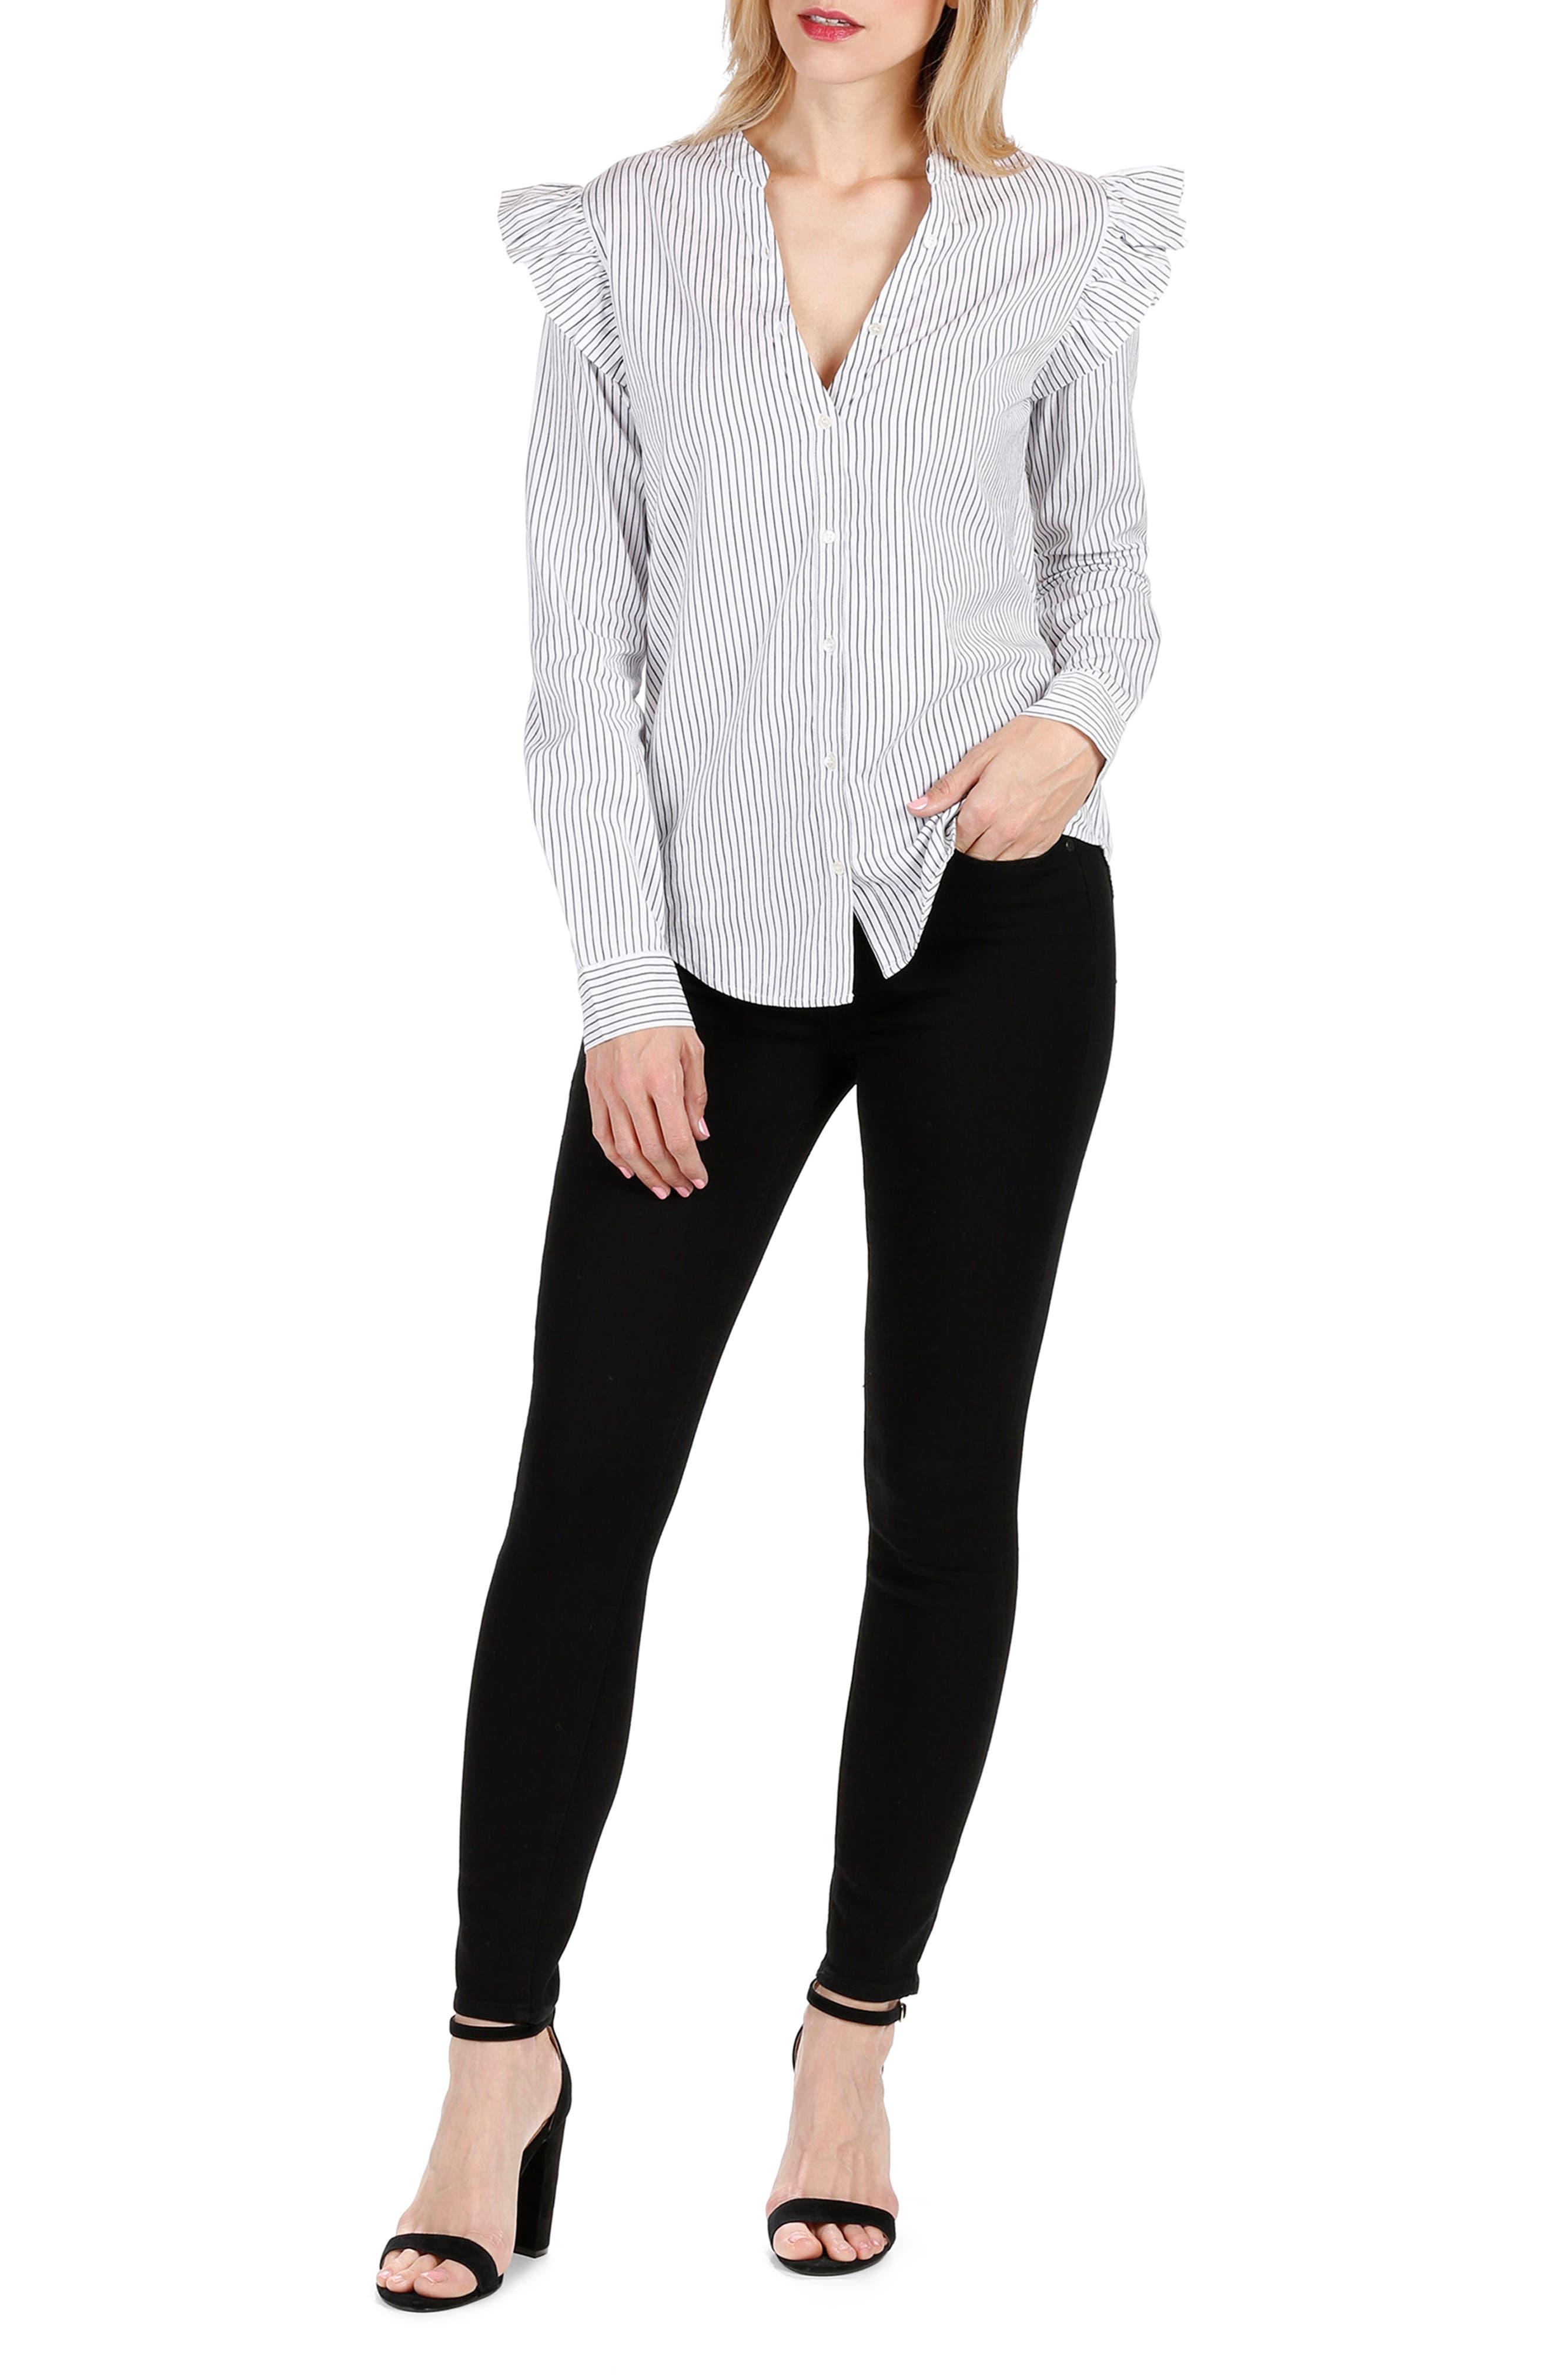 Jenelle Ruffle Dress Shirt,                             Alternate thumbnail 2, color,                             Black/ White Stripe